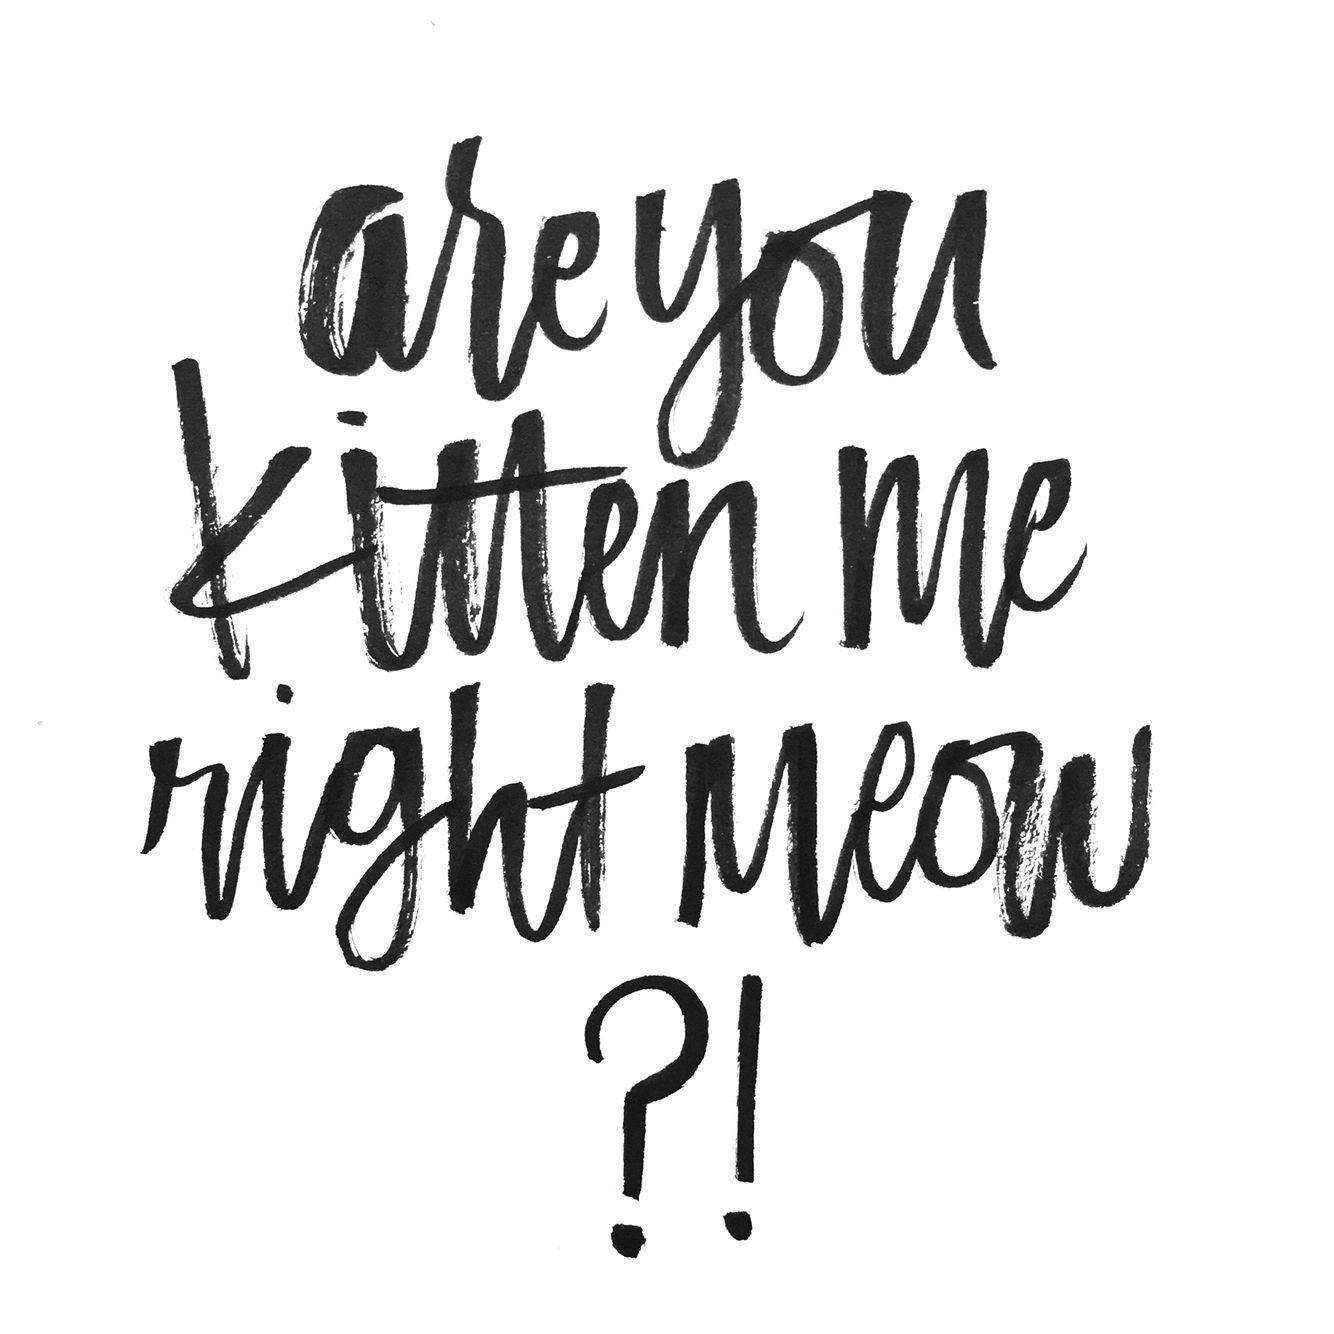 Are You Kitten Me Right Meow Cat Puns Brush Pen Lettering Lettering Cat Puns